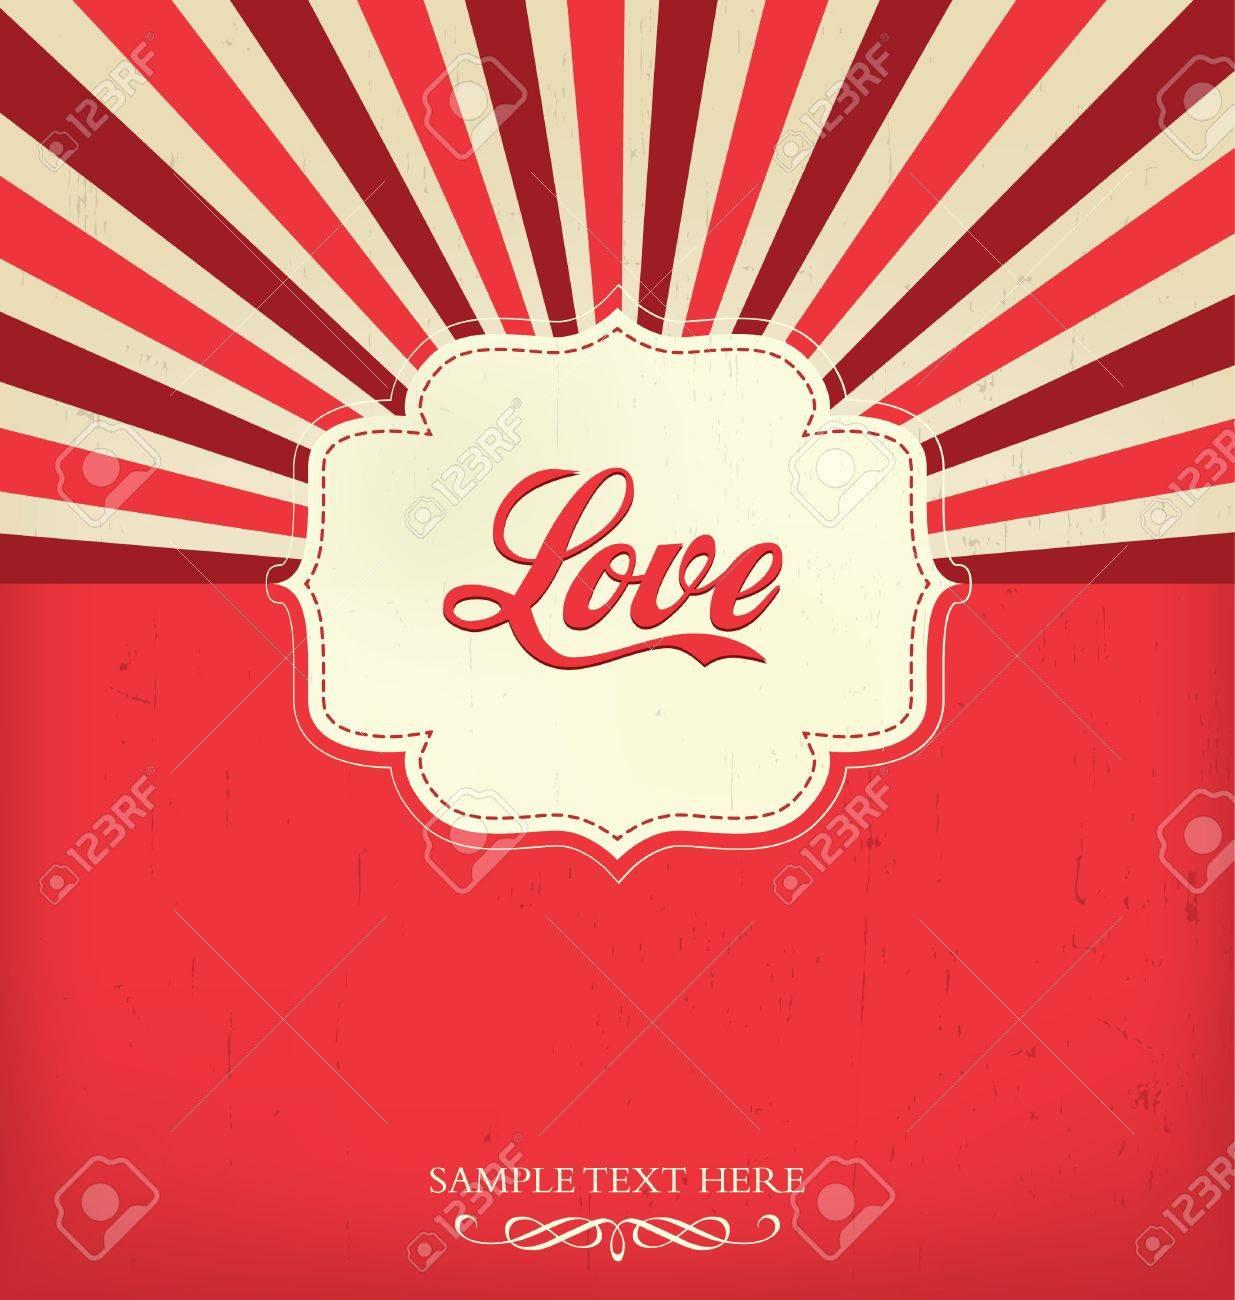 Love - Valentines Design Template Stock Vector - 16902151